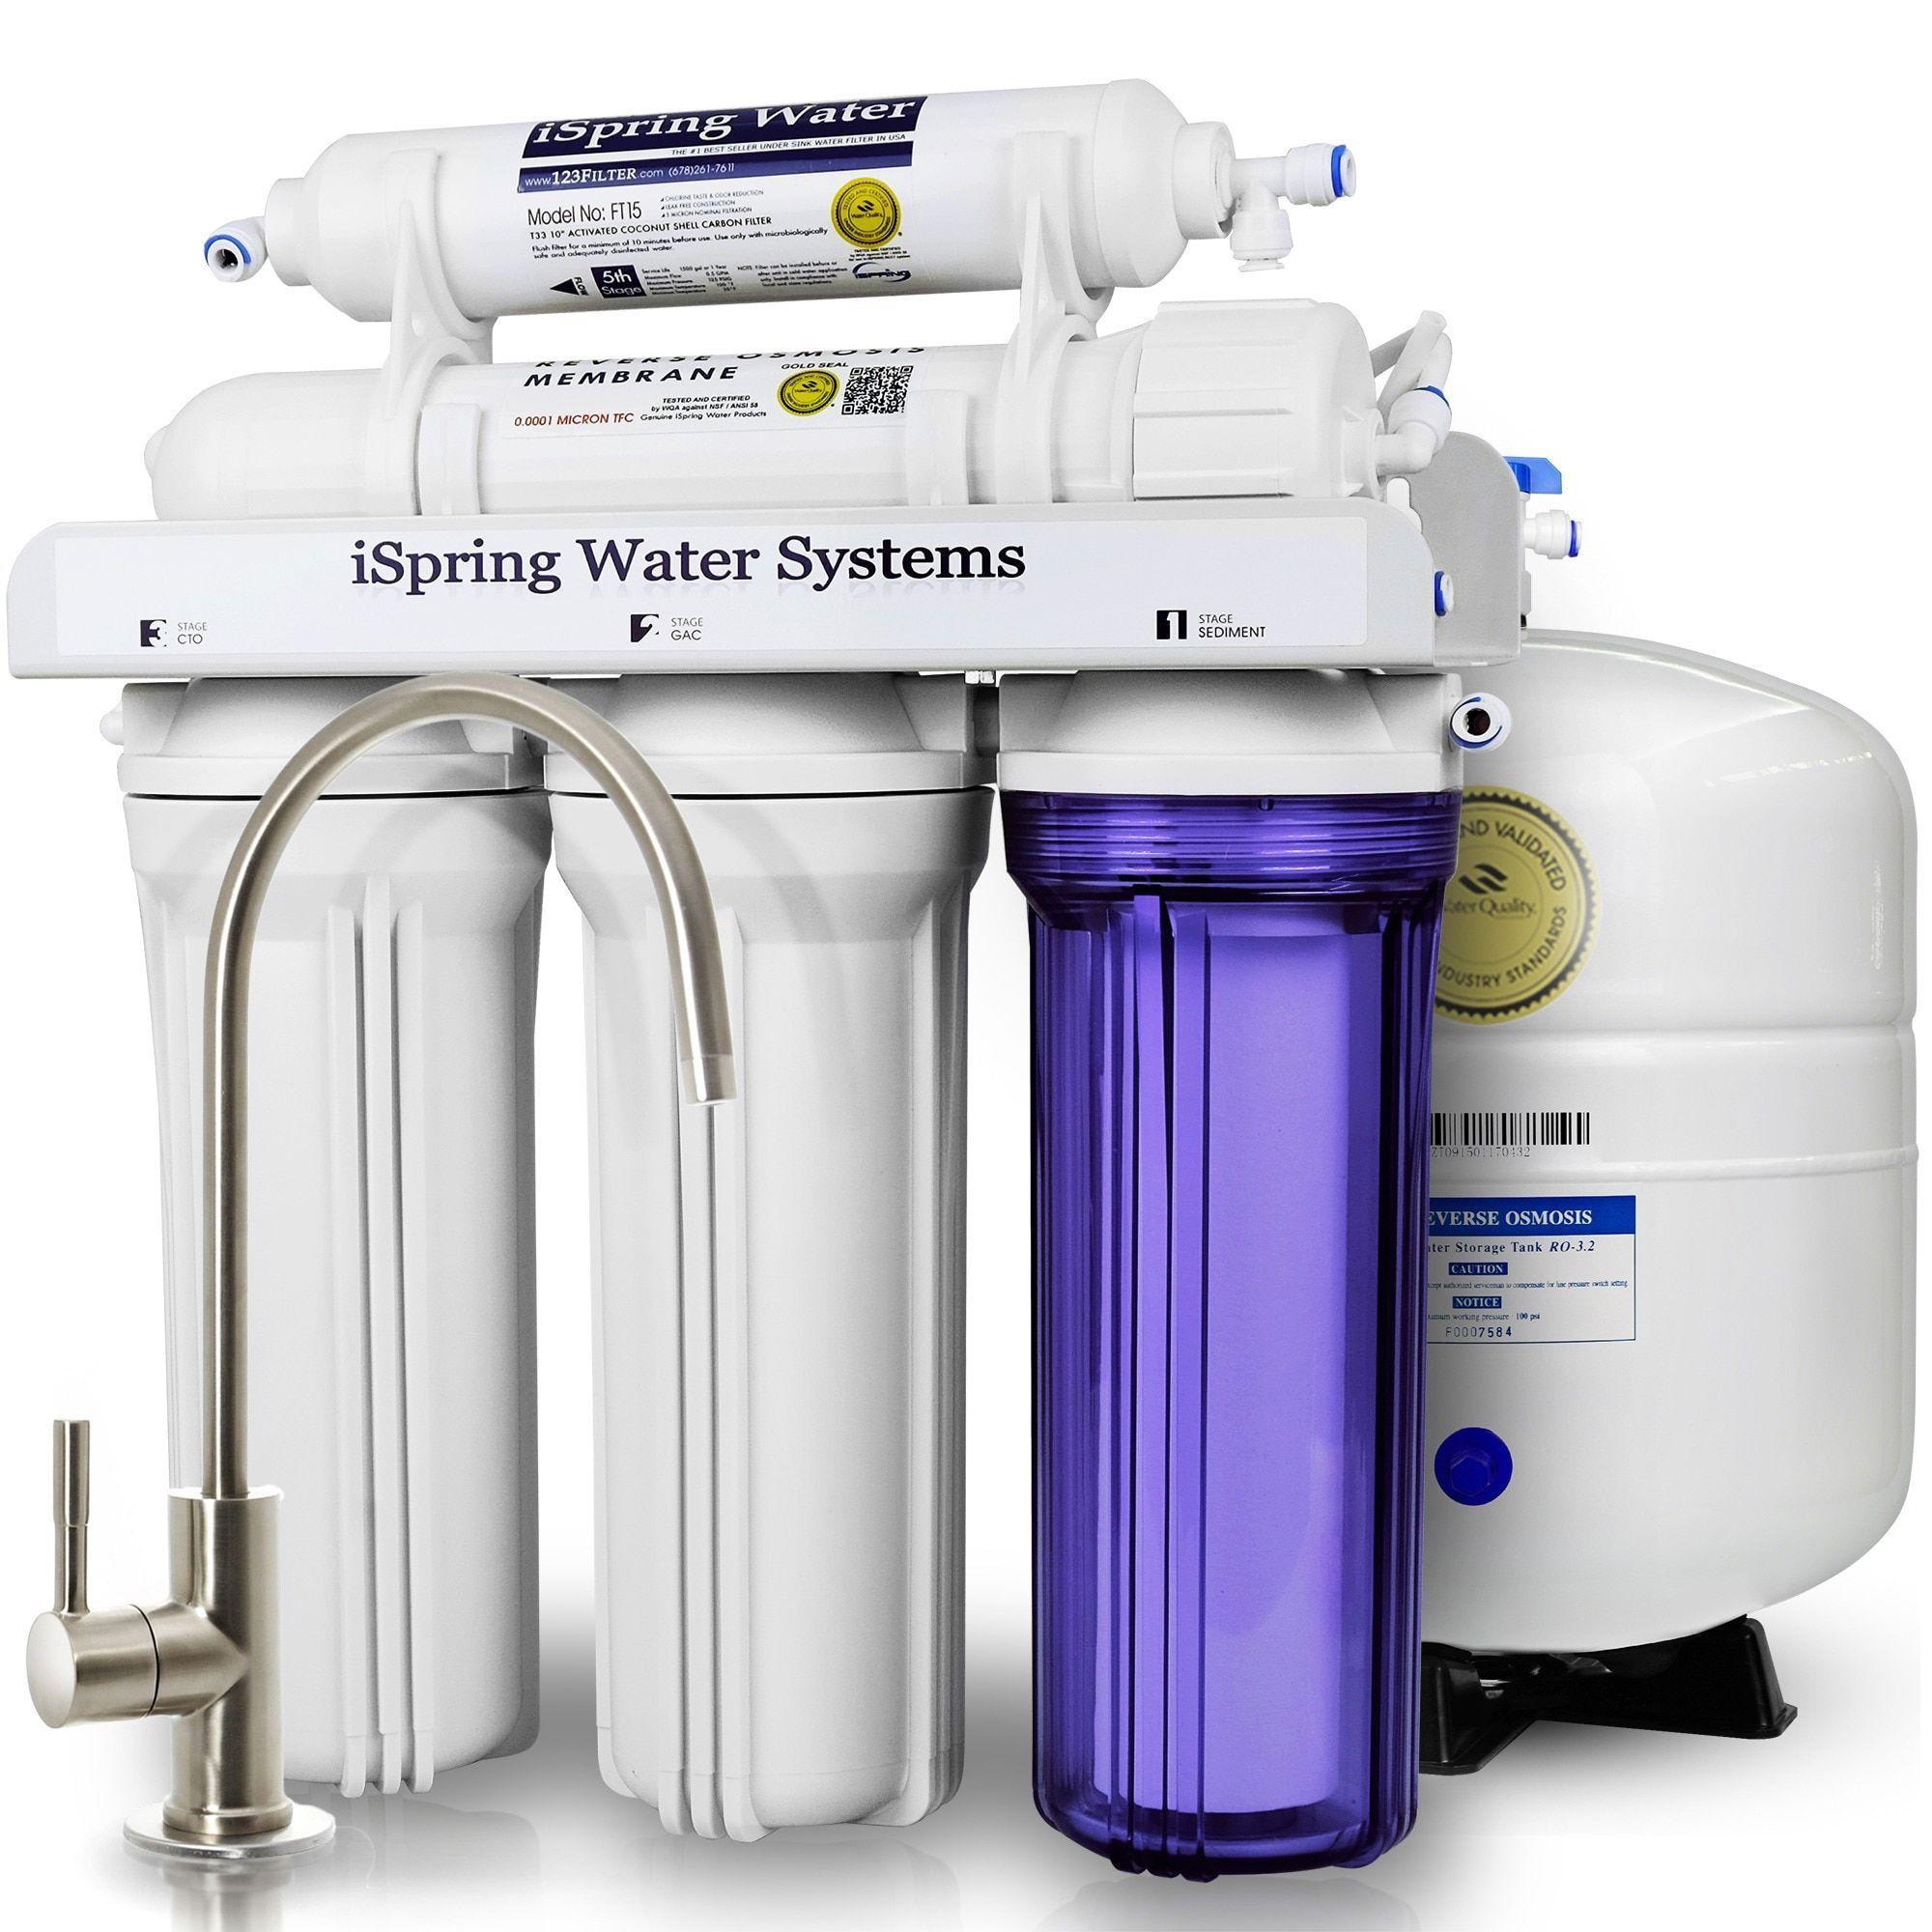 Pin By Tuhin On Tuhin Reverse Osmosis Water Filter Osmosis Water Filter Best Reverse Osmosis System